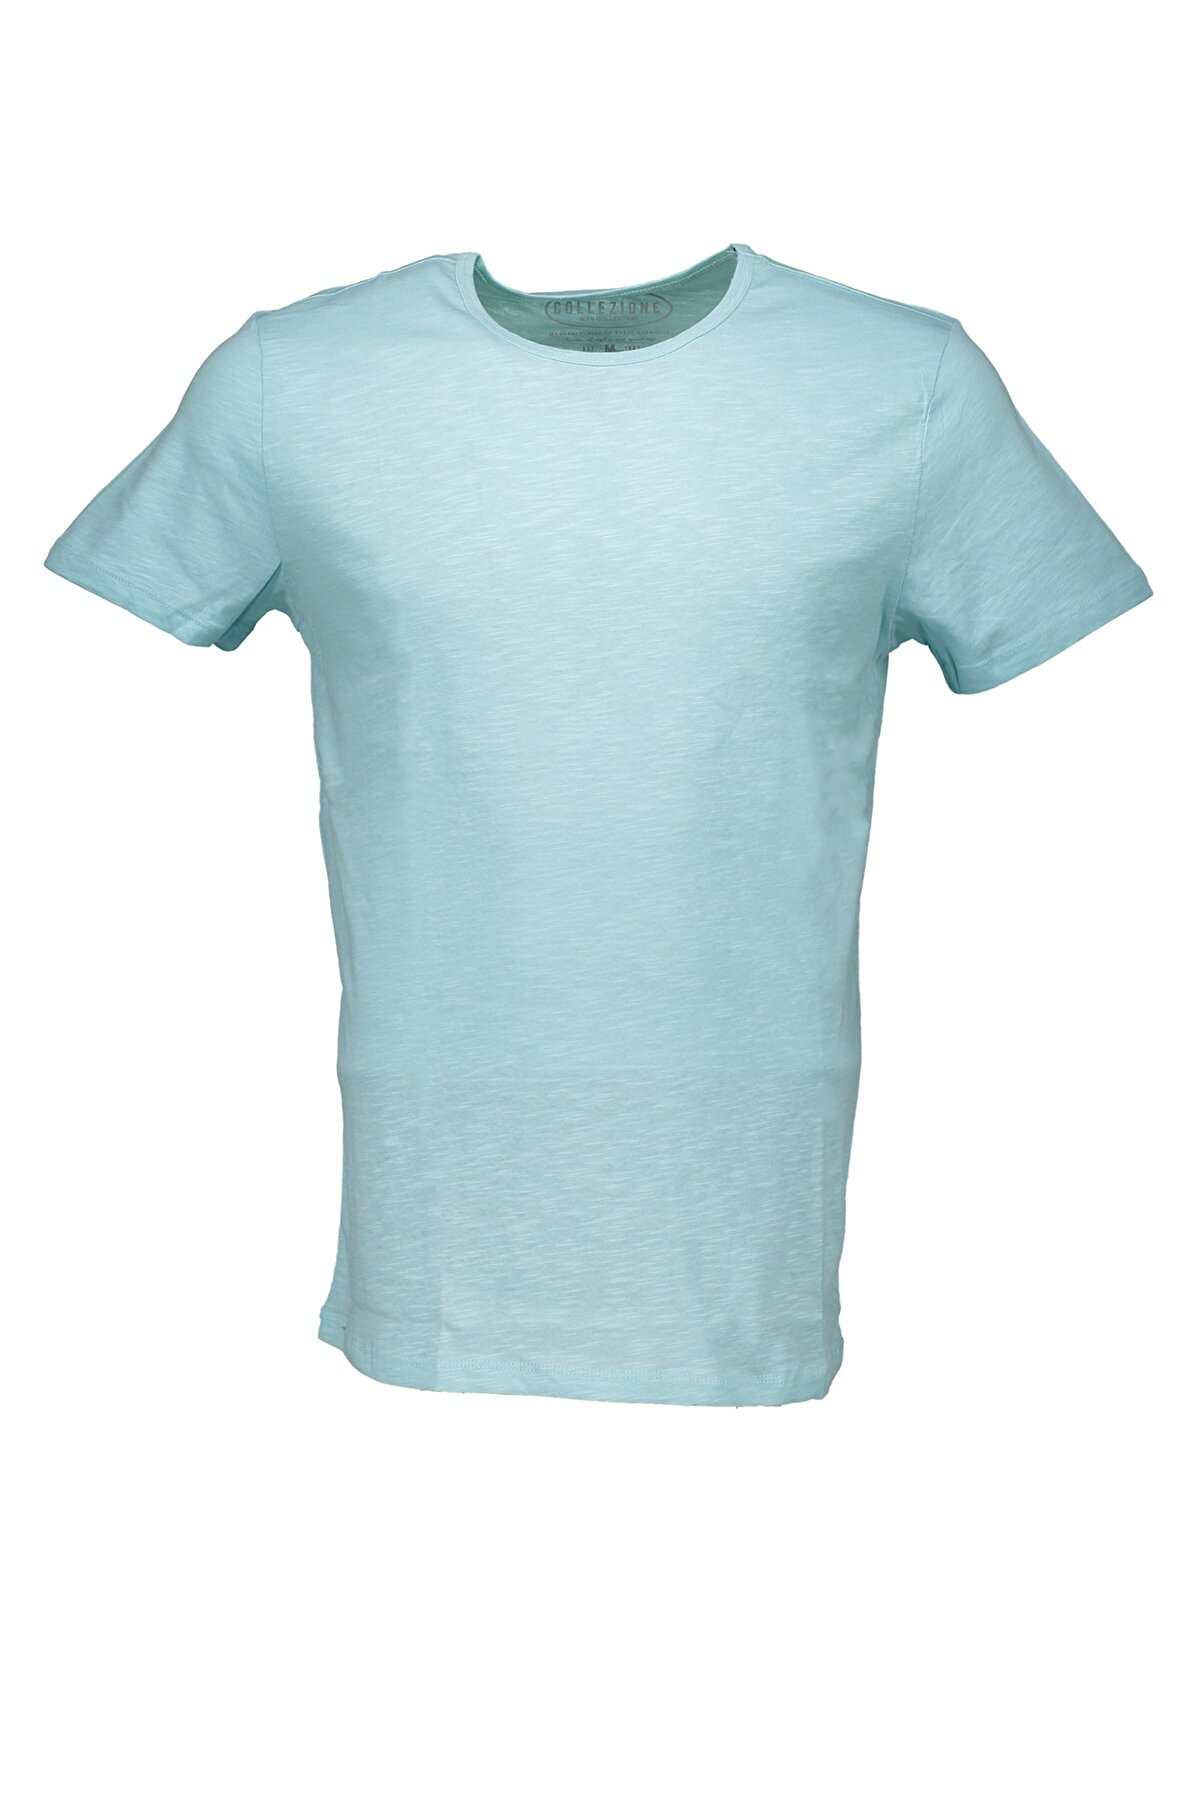 Collezione Mint Erkek Somon Spor Regular Kısa Kol T-shirt